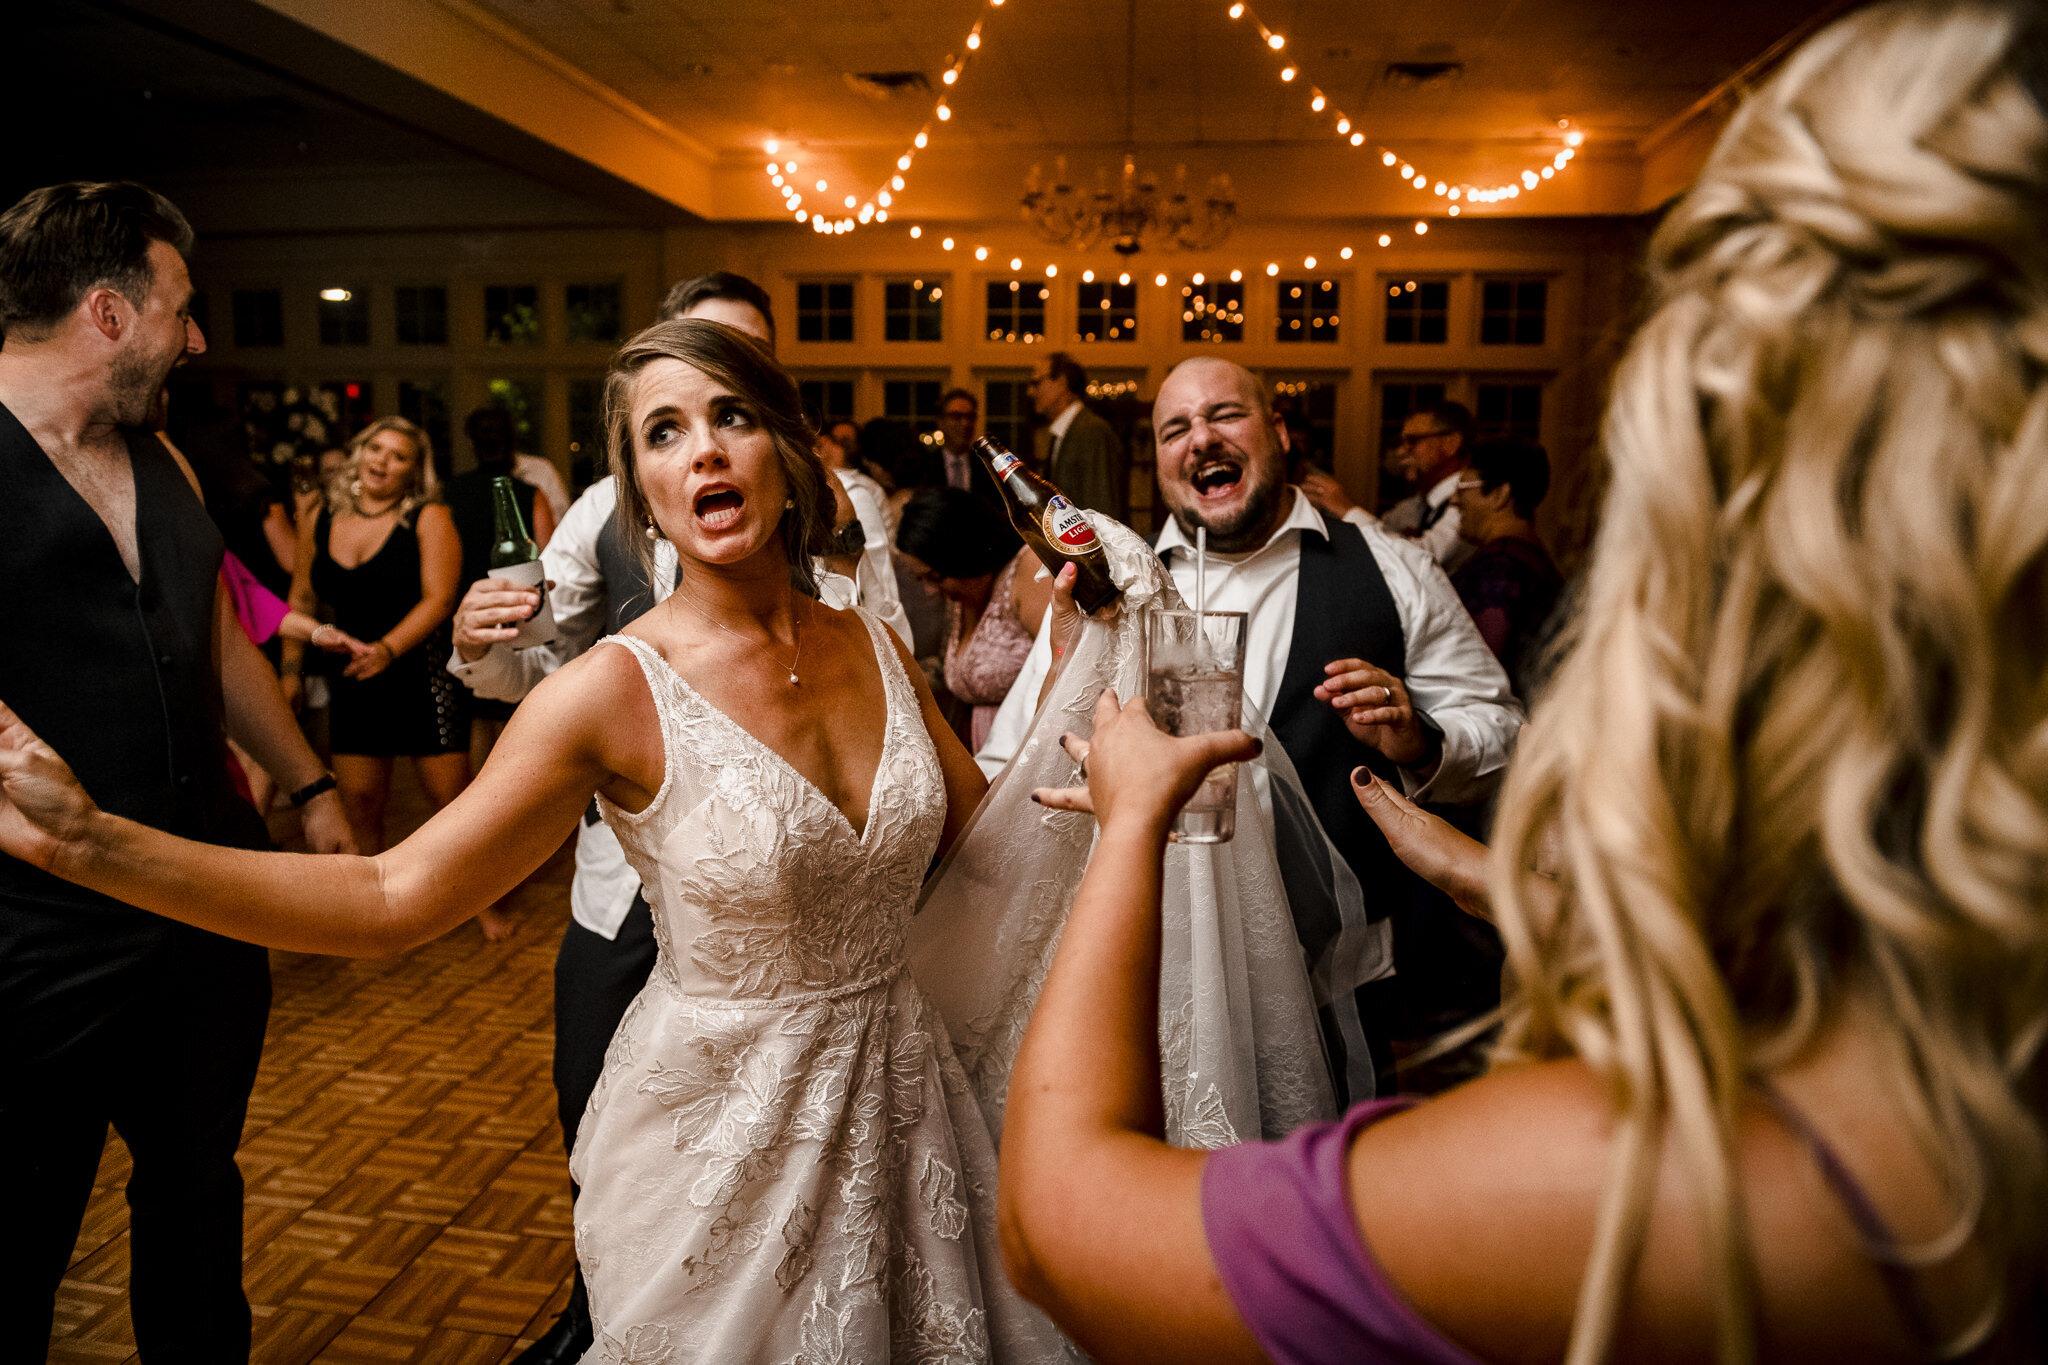 Coyle-Forsgate-Country-Club-Wedding-Photographer-60.JPG